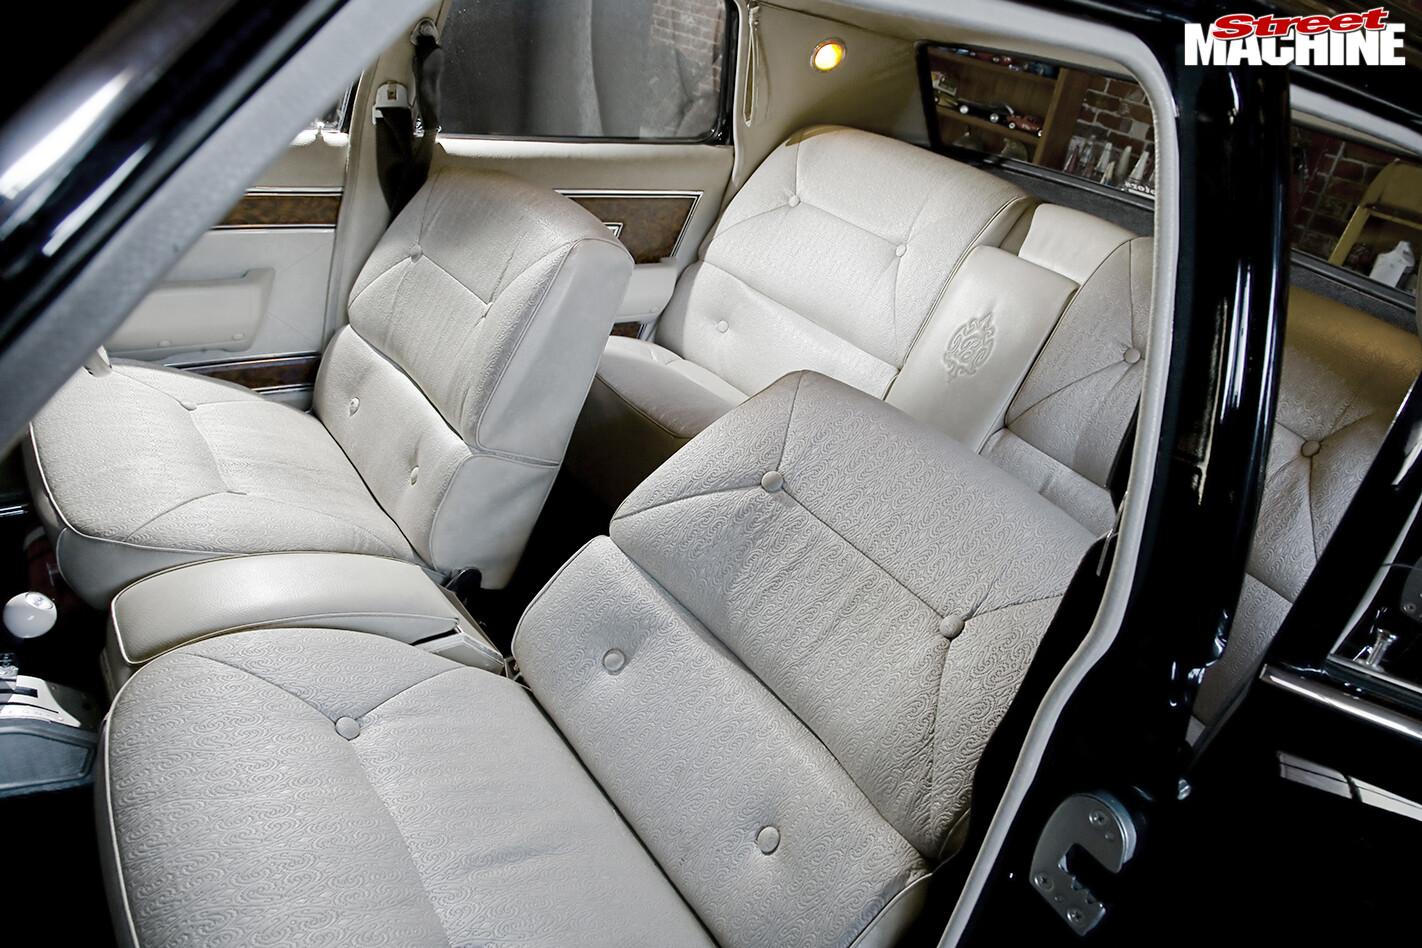 Holden -Brougham -interior -seats